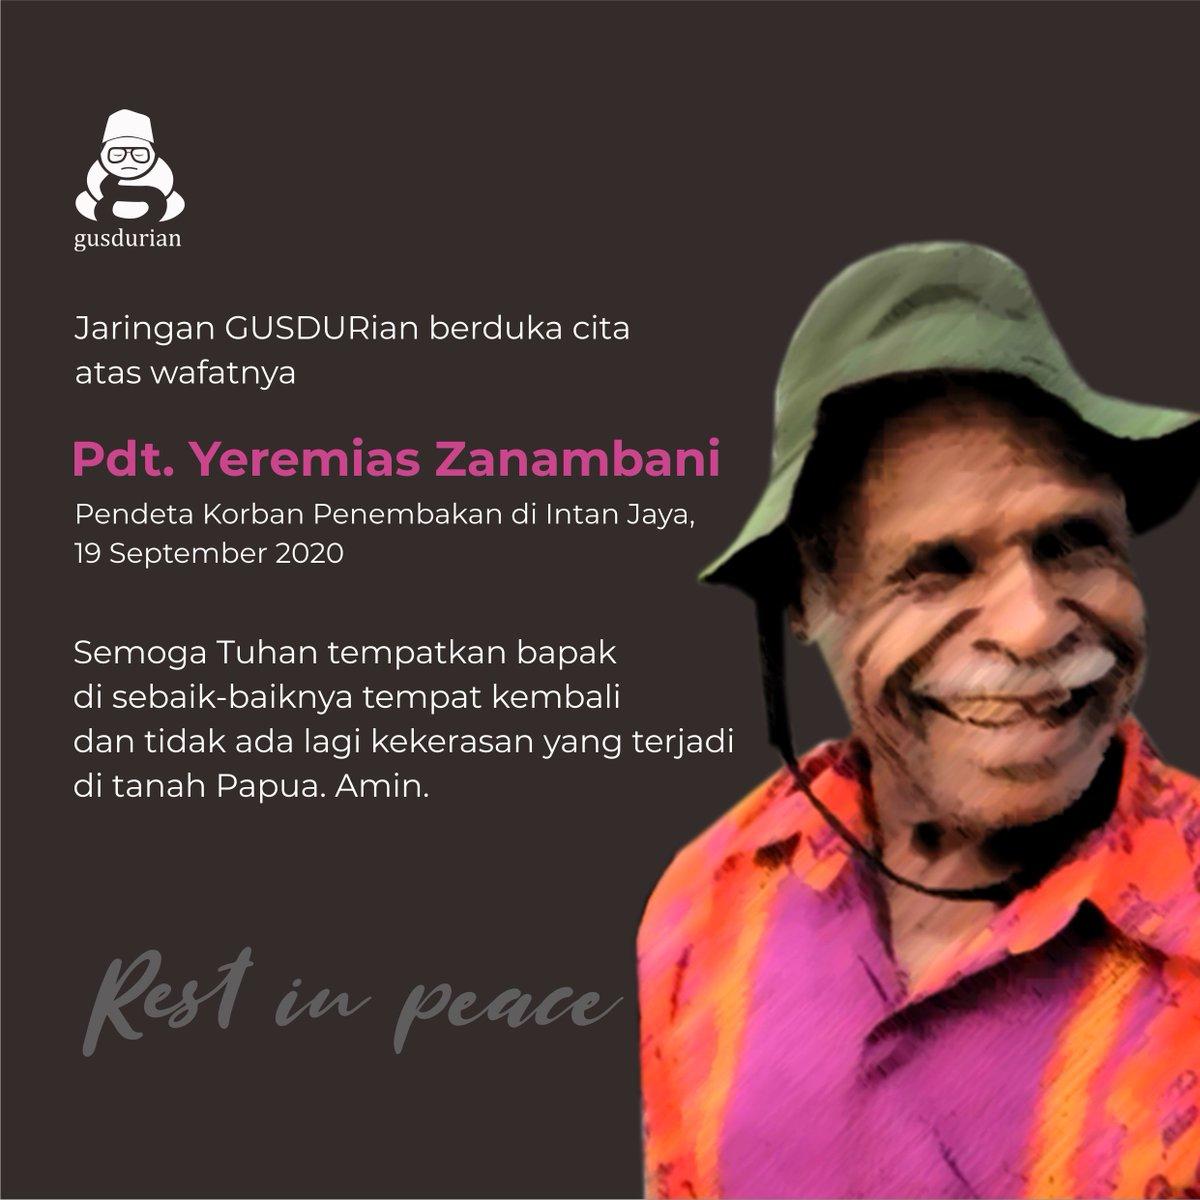 Rest in peace. Jaringan GUSDURian berduka cita atas wafatnya Pdt. Yeremias Zanambani, pendeta yang menjadi korban penembakan di Intan Jaya, Papua. Semoga Bapak Pendeta ditempatkan di tempat terbaik di sisi-Nya dan tidak ada lagi kasus kekerasan di tanah Papua #PapuanLivesMatter https://t.co/PvhglSCcPQ